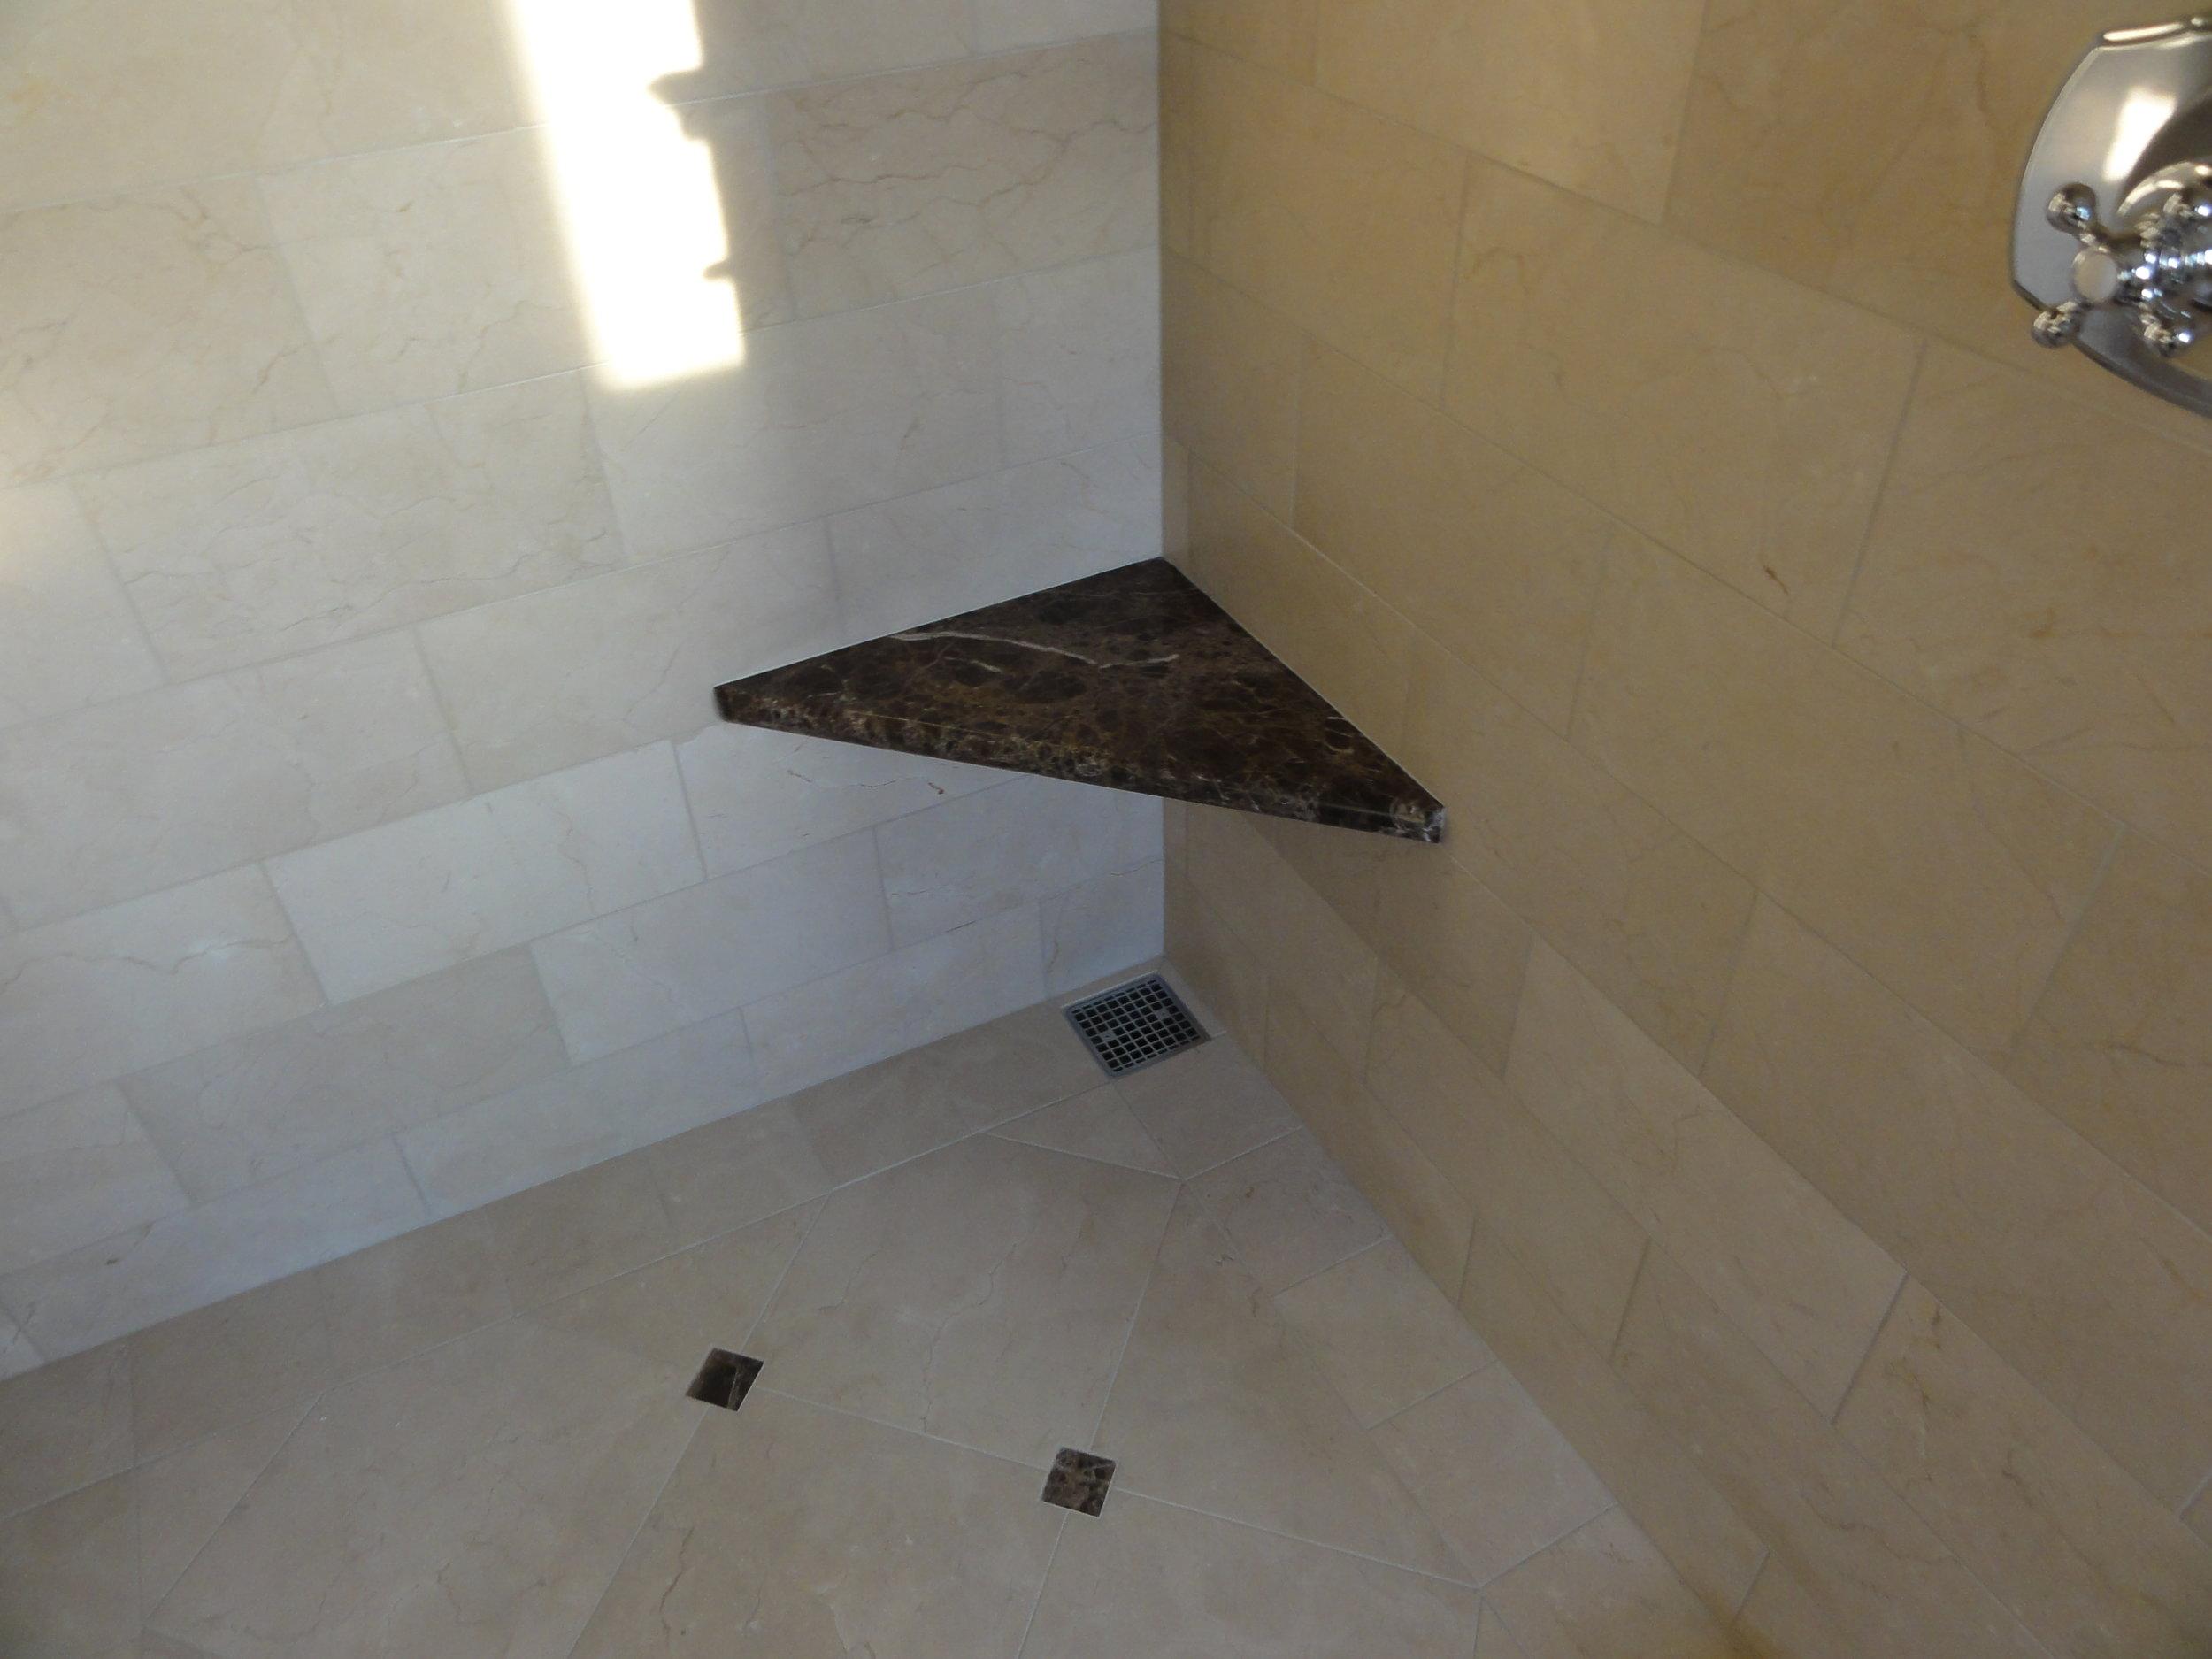 corner drain 1.jpg